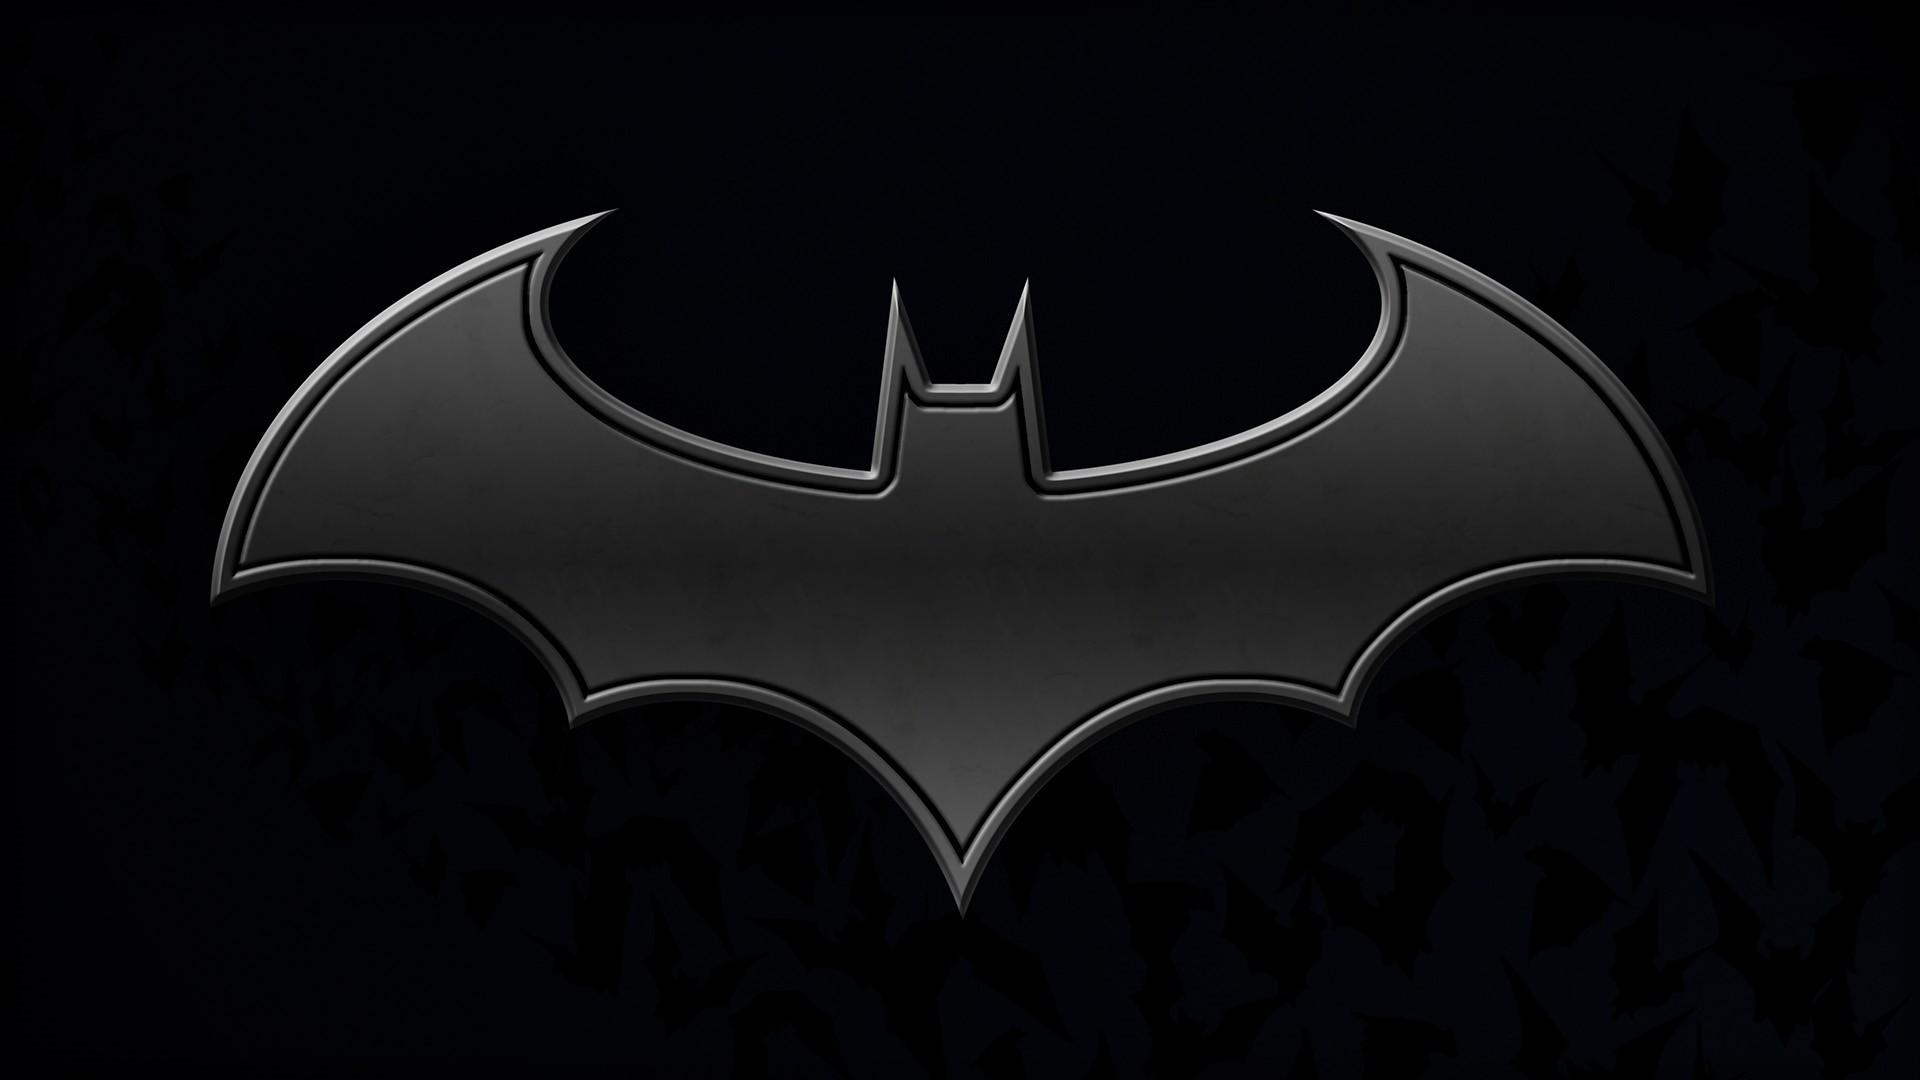 Batman Wallpapers 72 Pictures